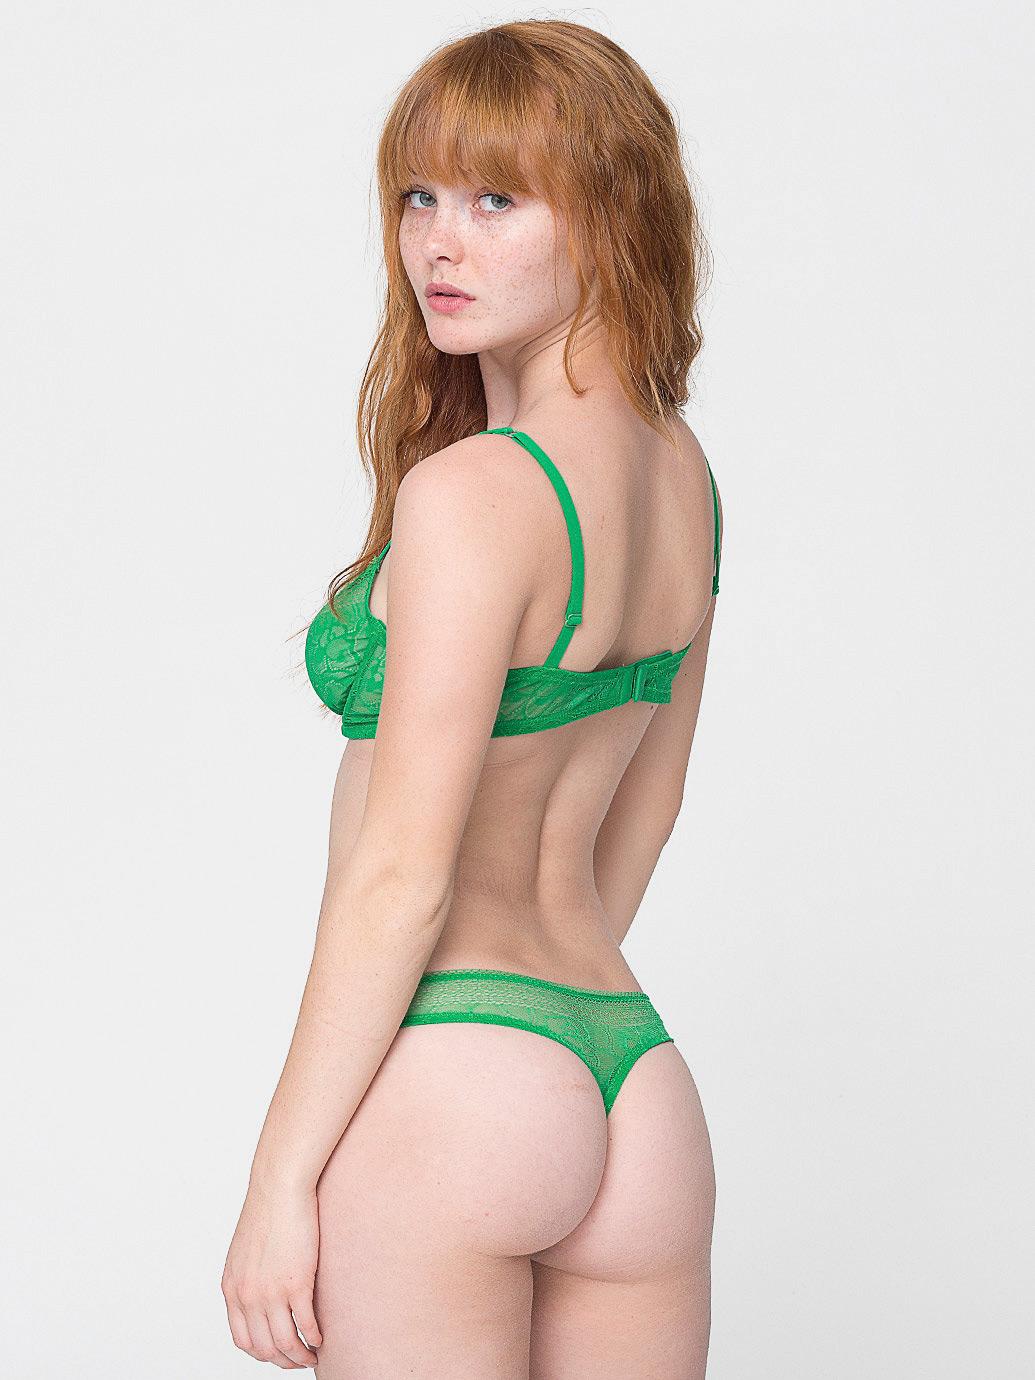 Cute sexy redhead